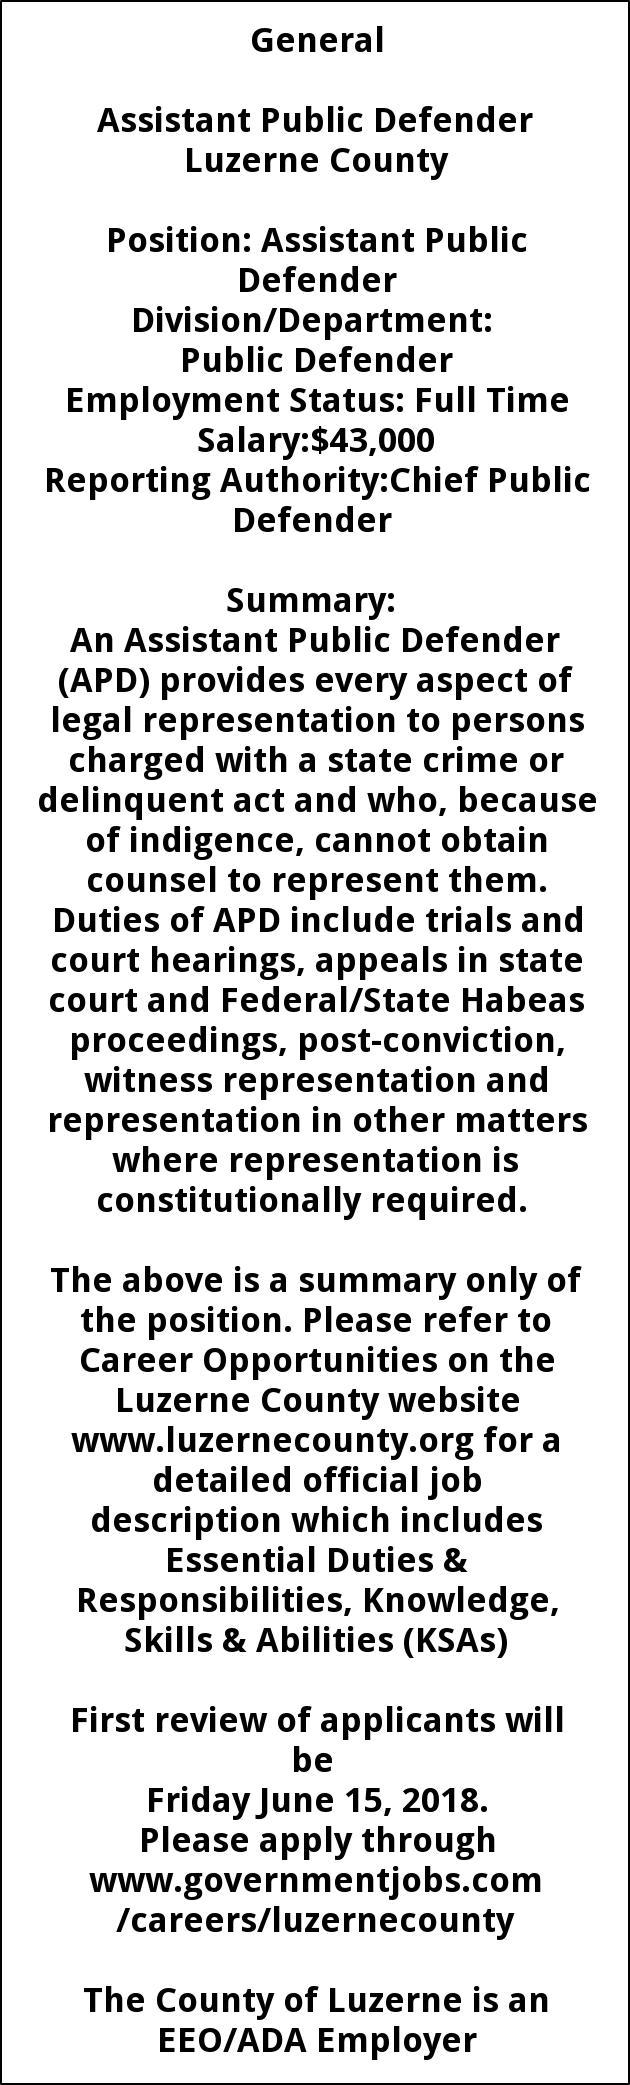 Assistant Public Defender